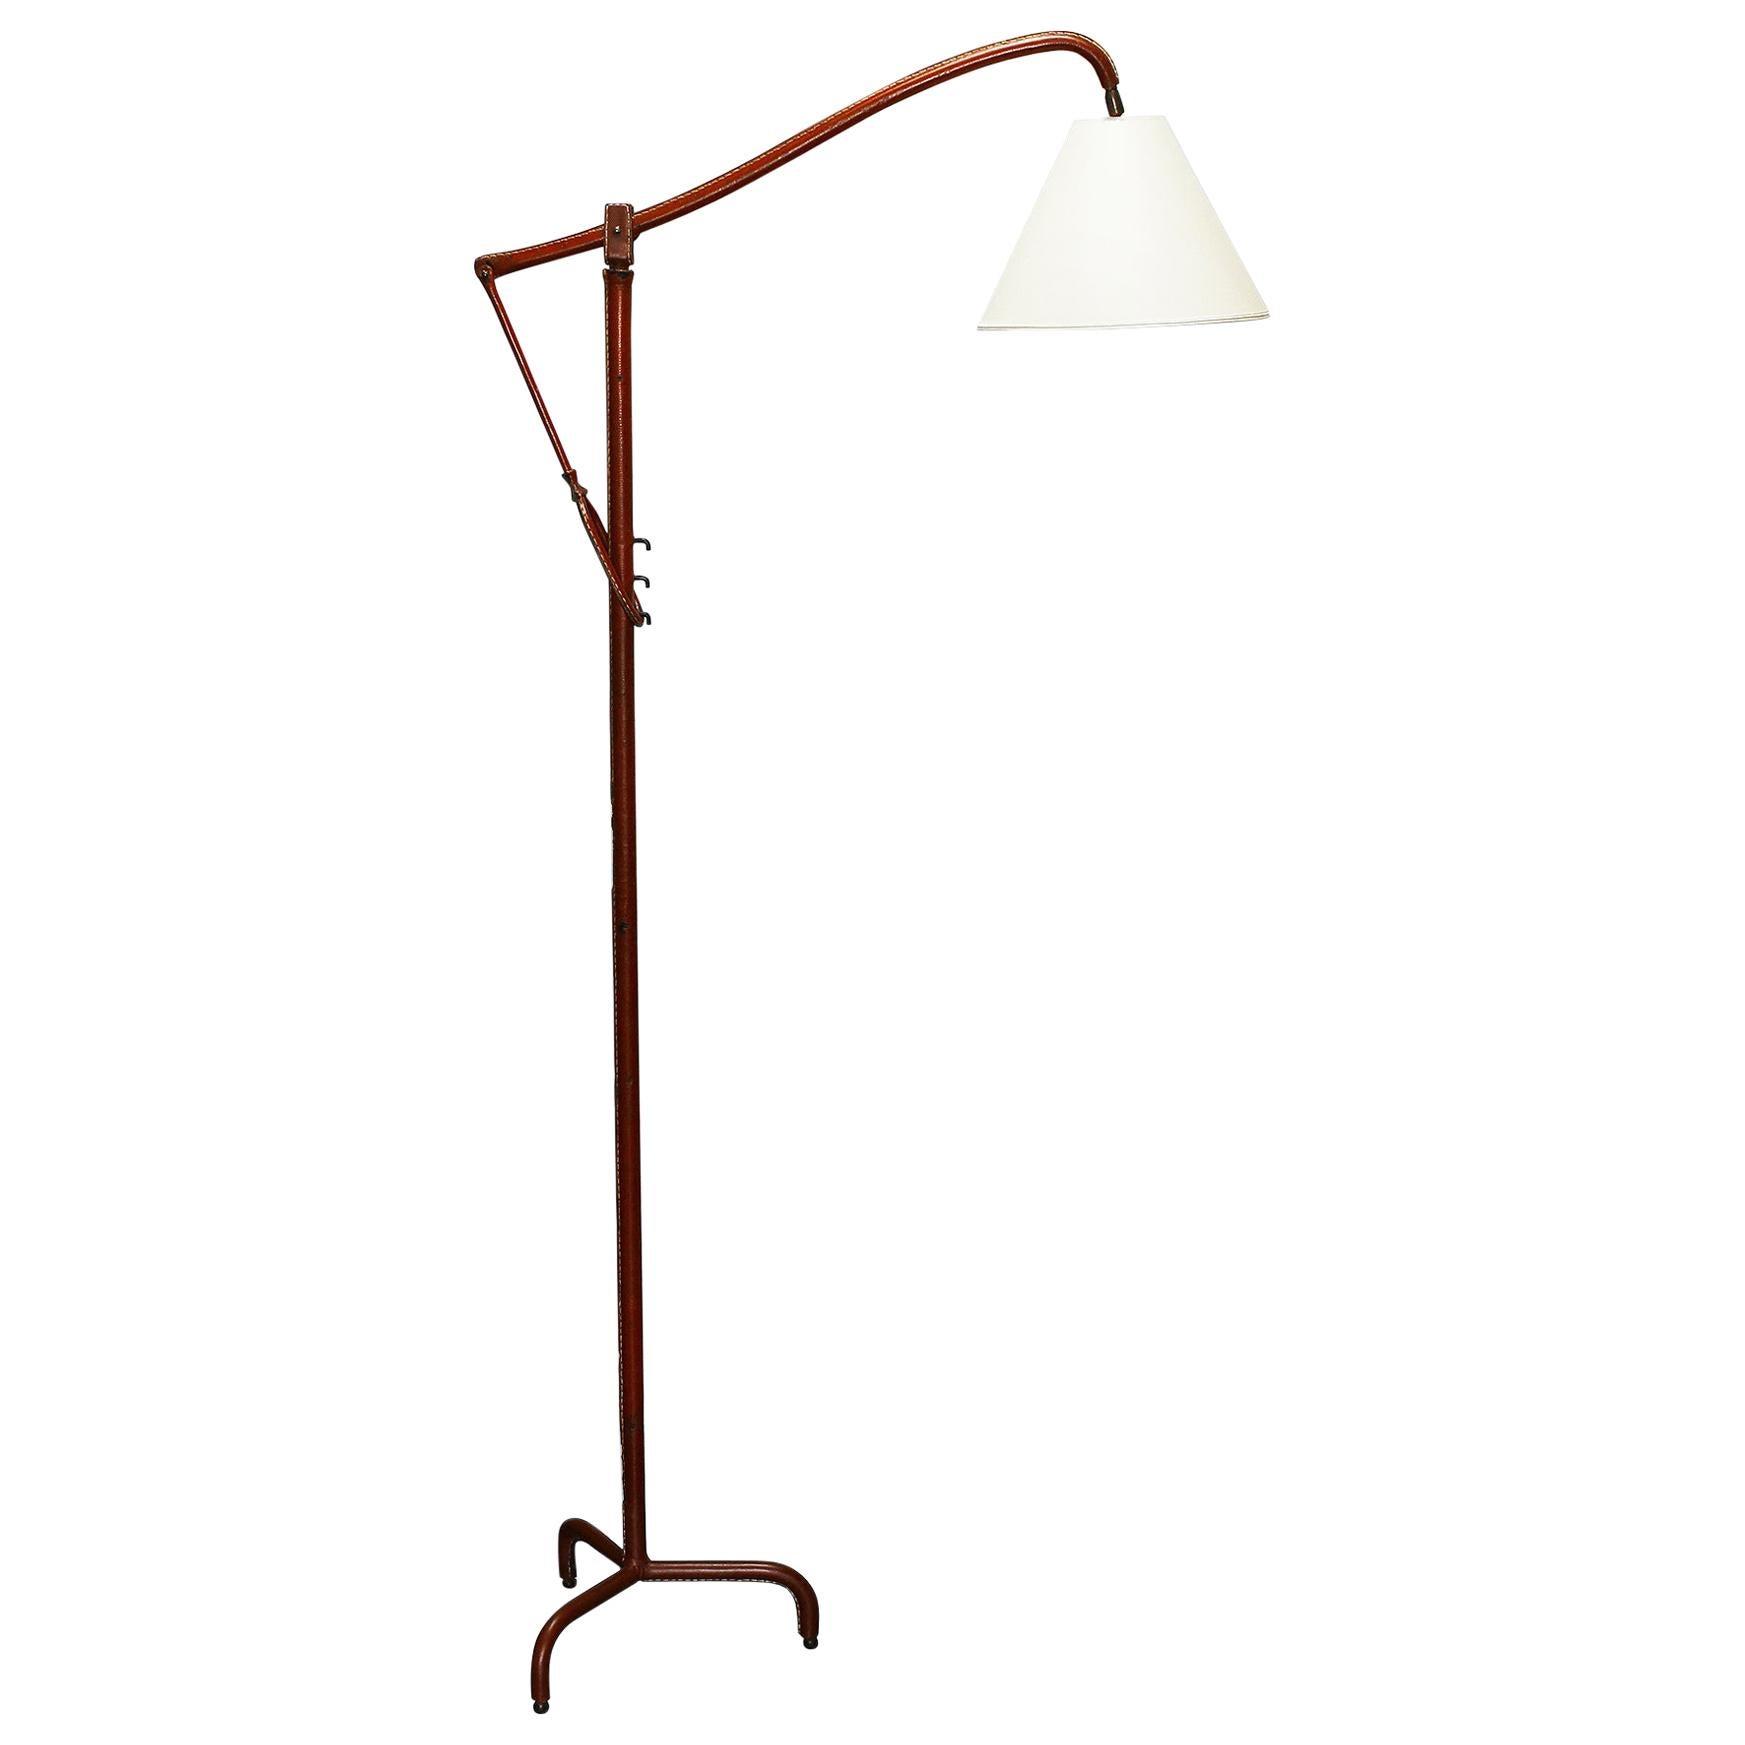 Jacques Adnet Original Leather Floor Lamp